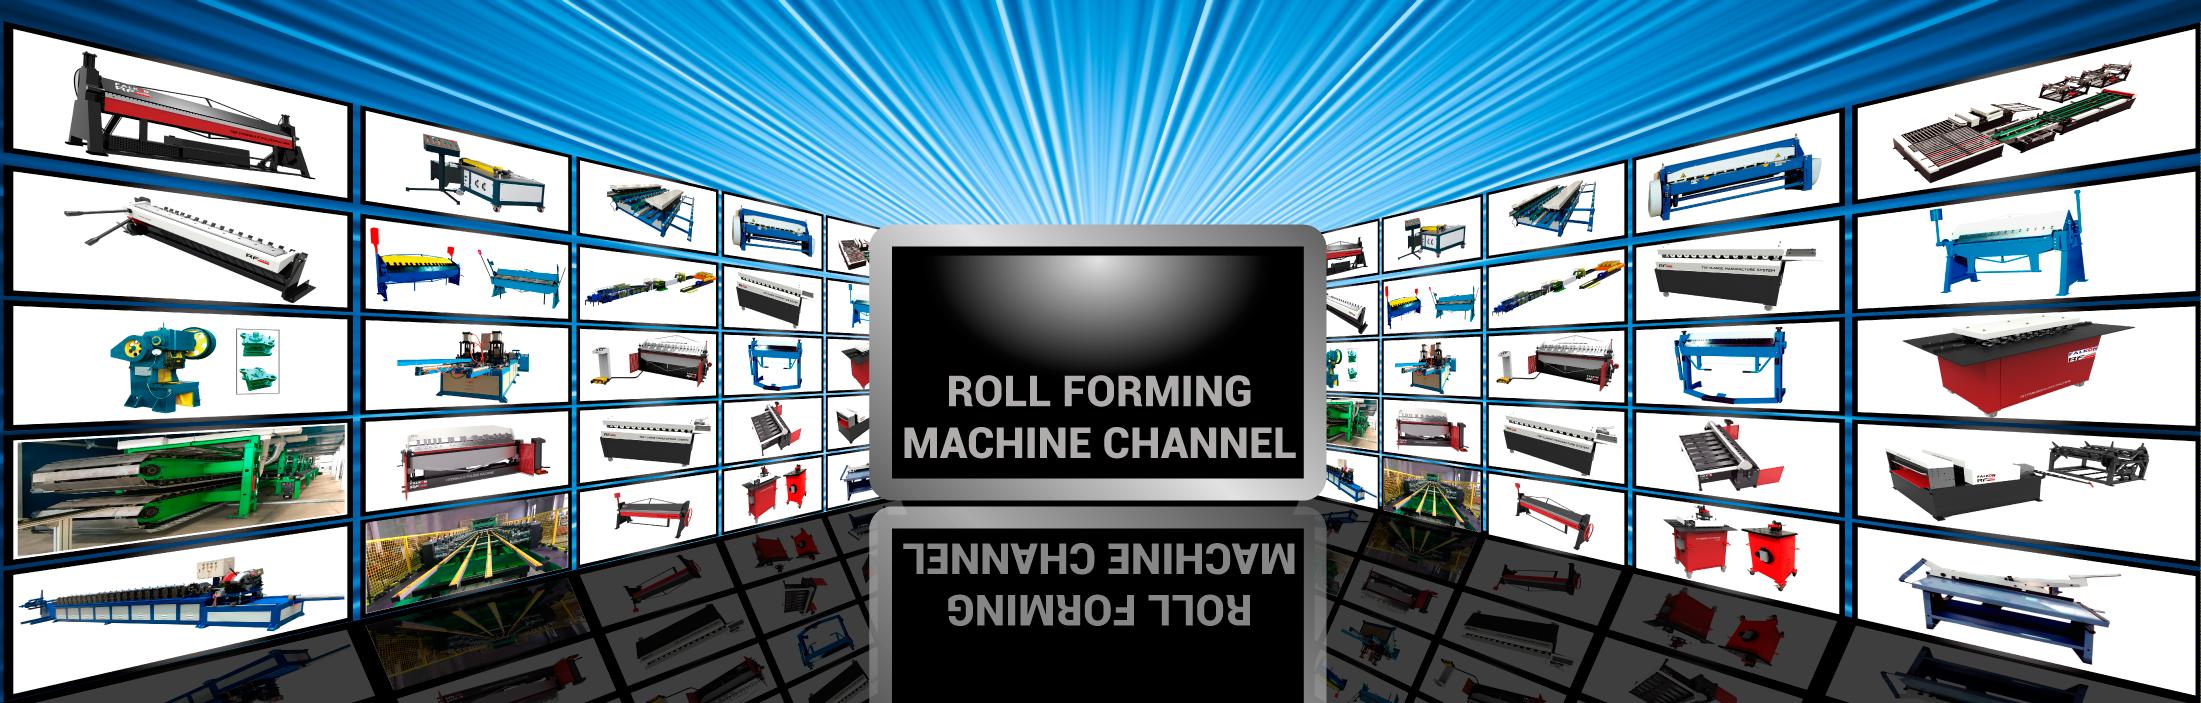 machine-banner3.png